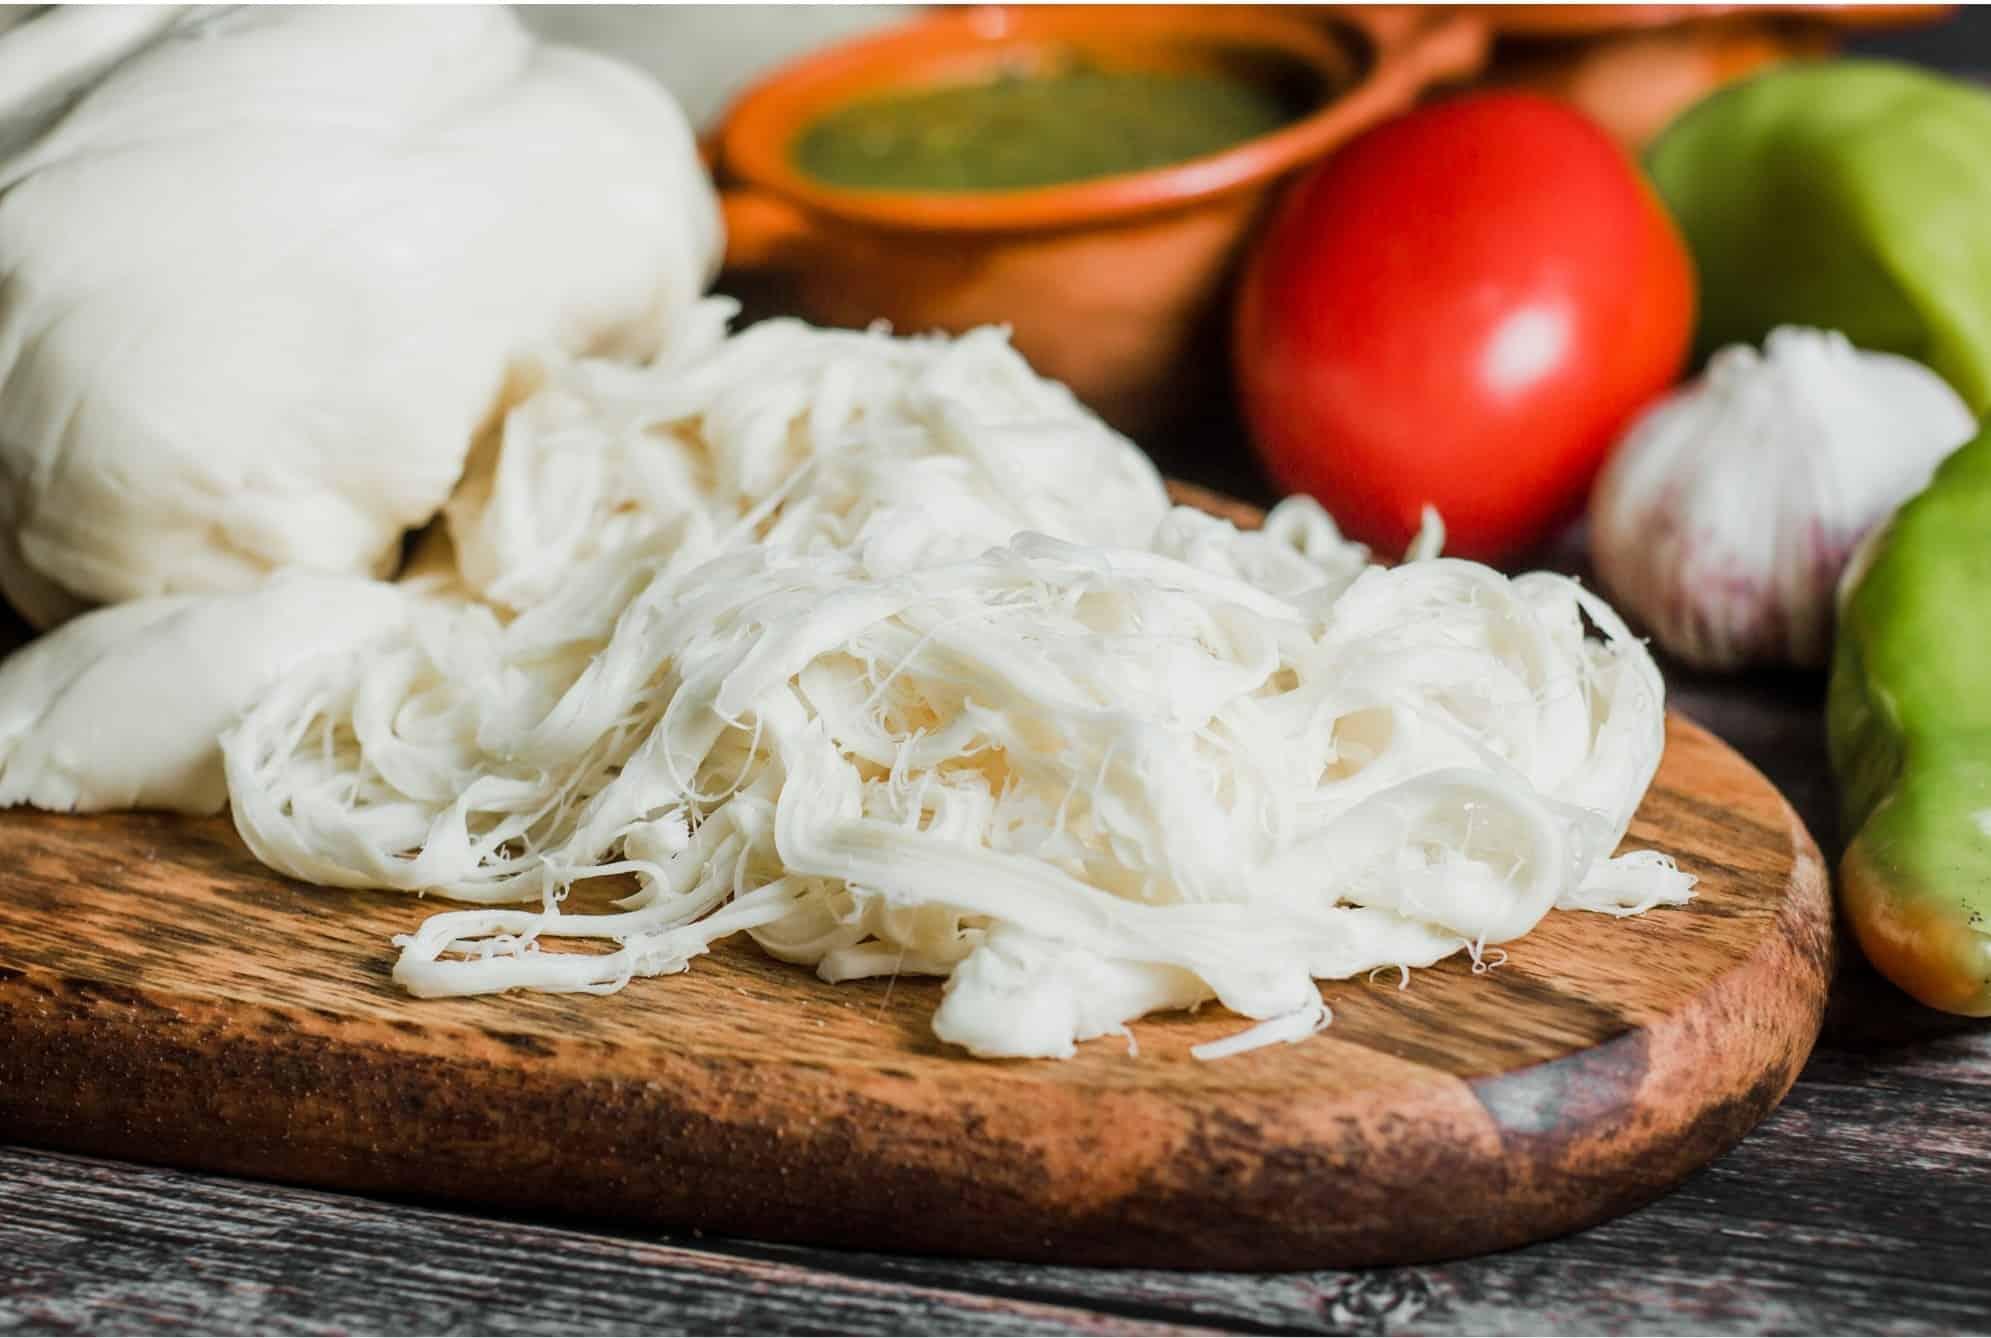 oaxaca cheese freshly made on a cutting board